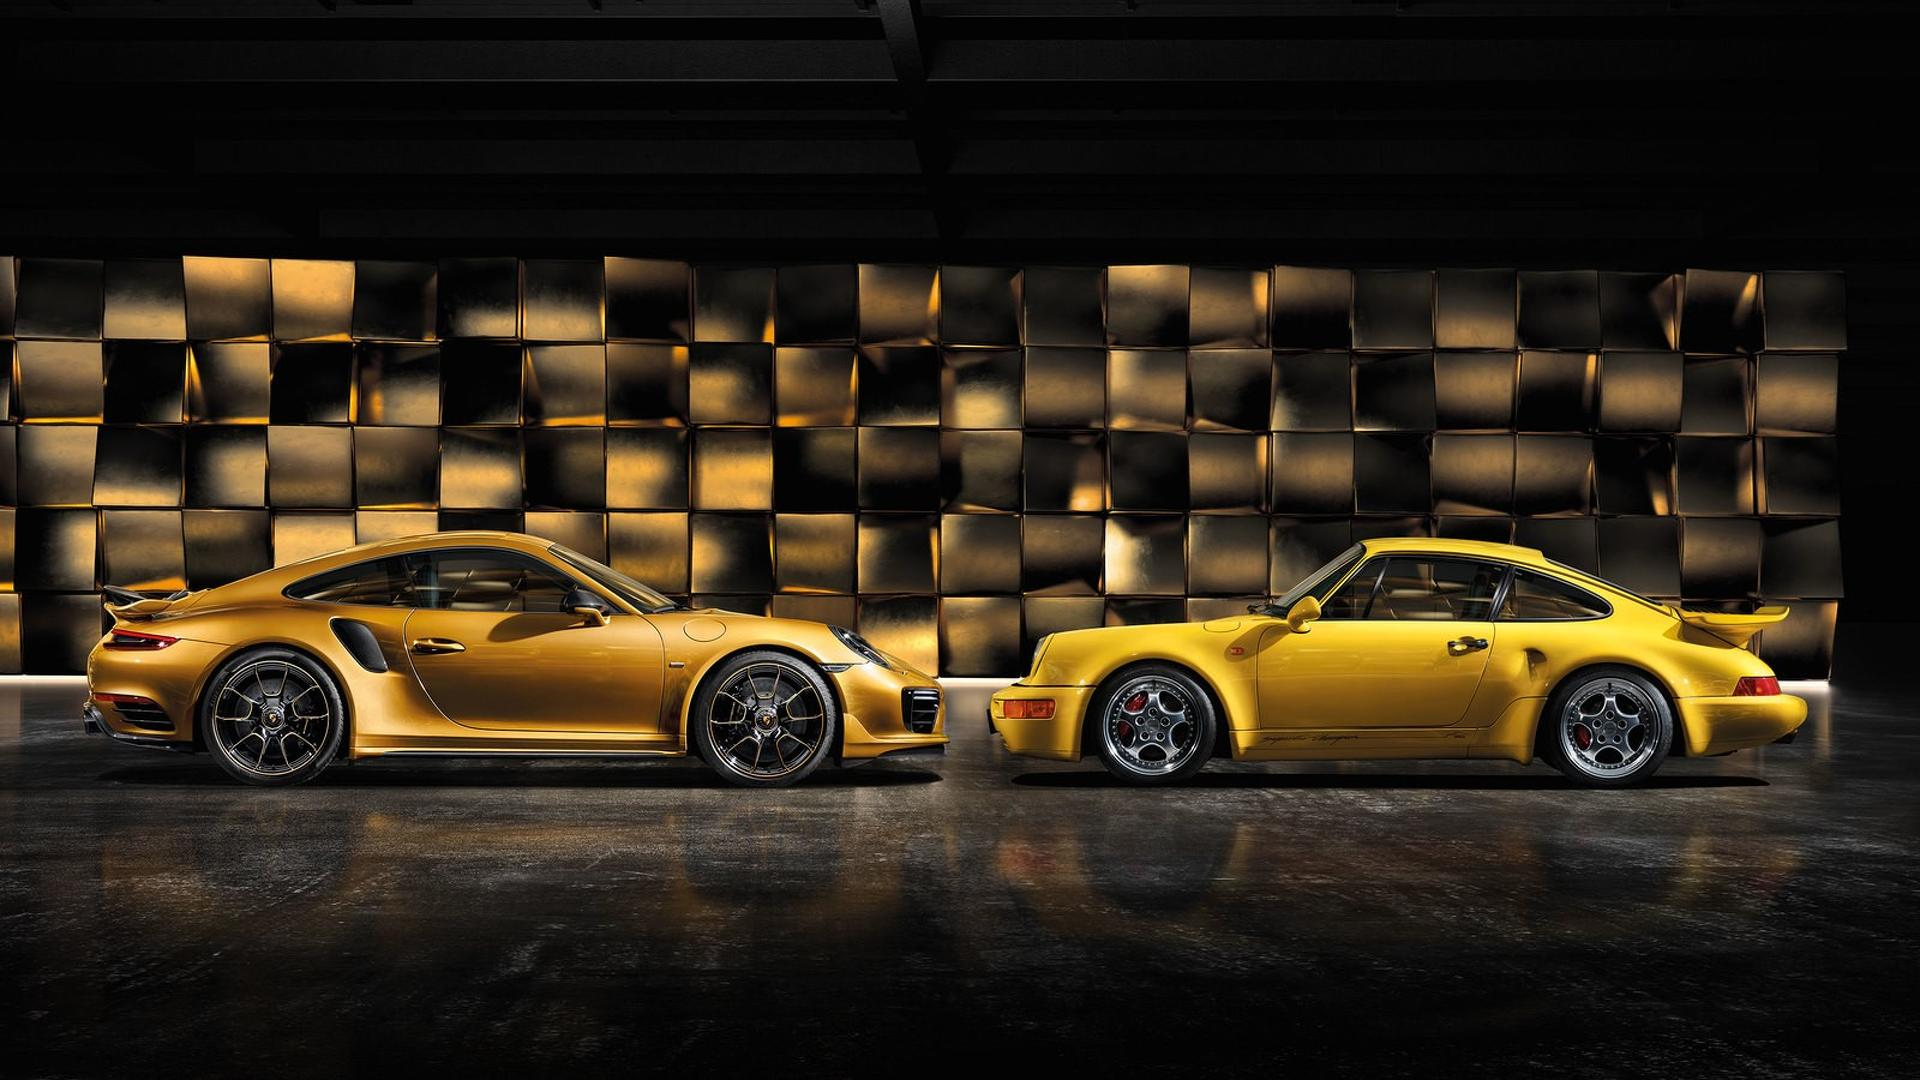 Porsche_911_Turbo_S_Exclusive_Series_05